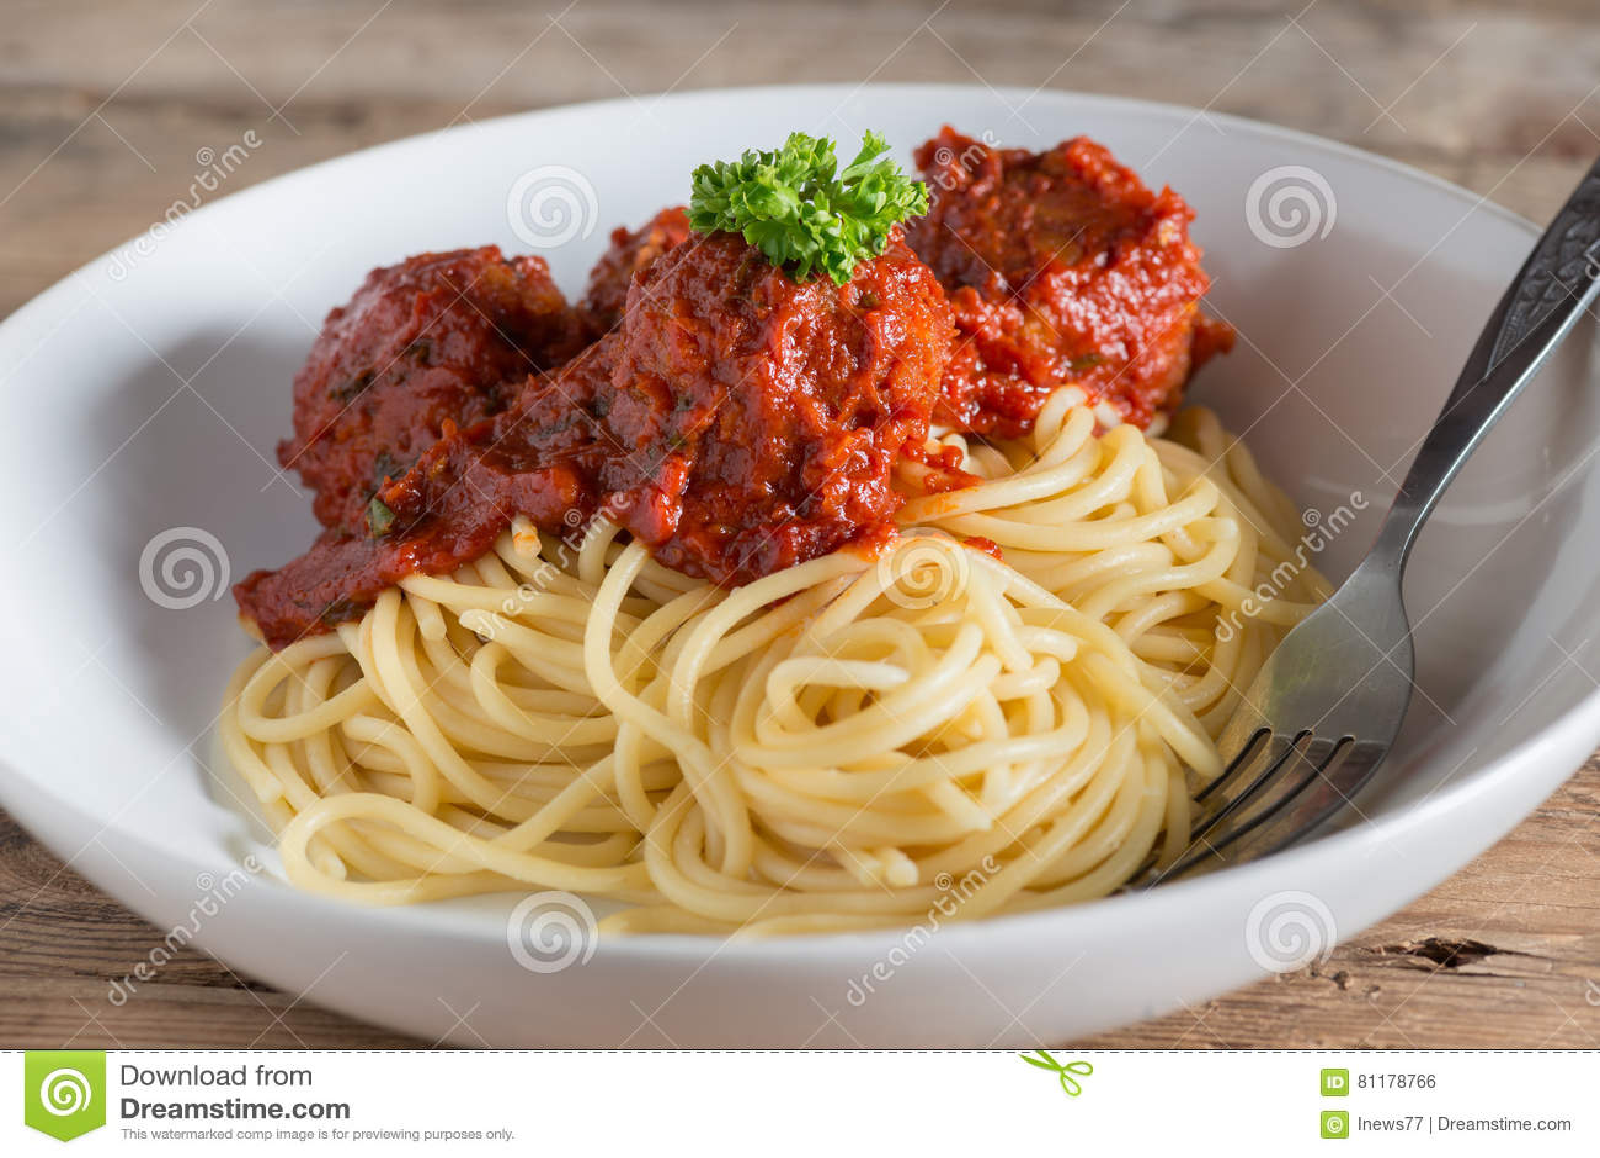 Espaguetes e almôndegas na placa branca